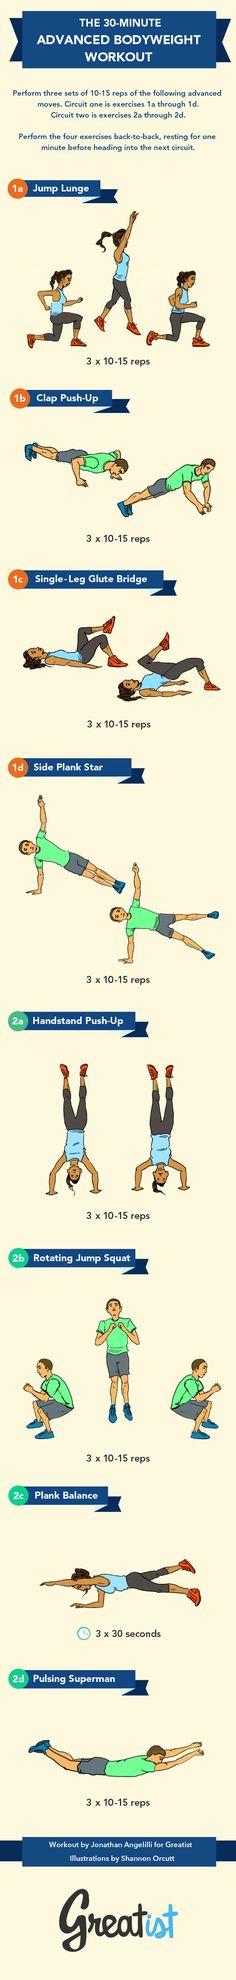 30-Minute Advanced Bodyweight Workout http://greatist.com/fitness/advanced-bodyweight-workout-infographic